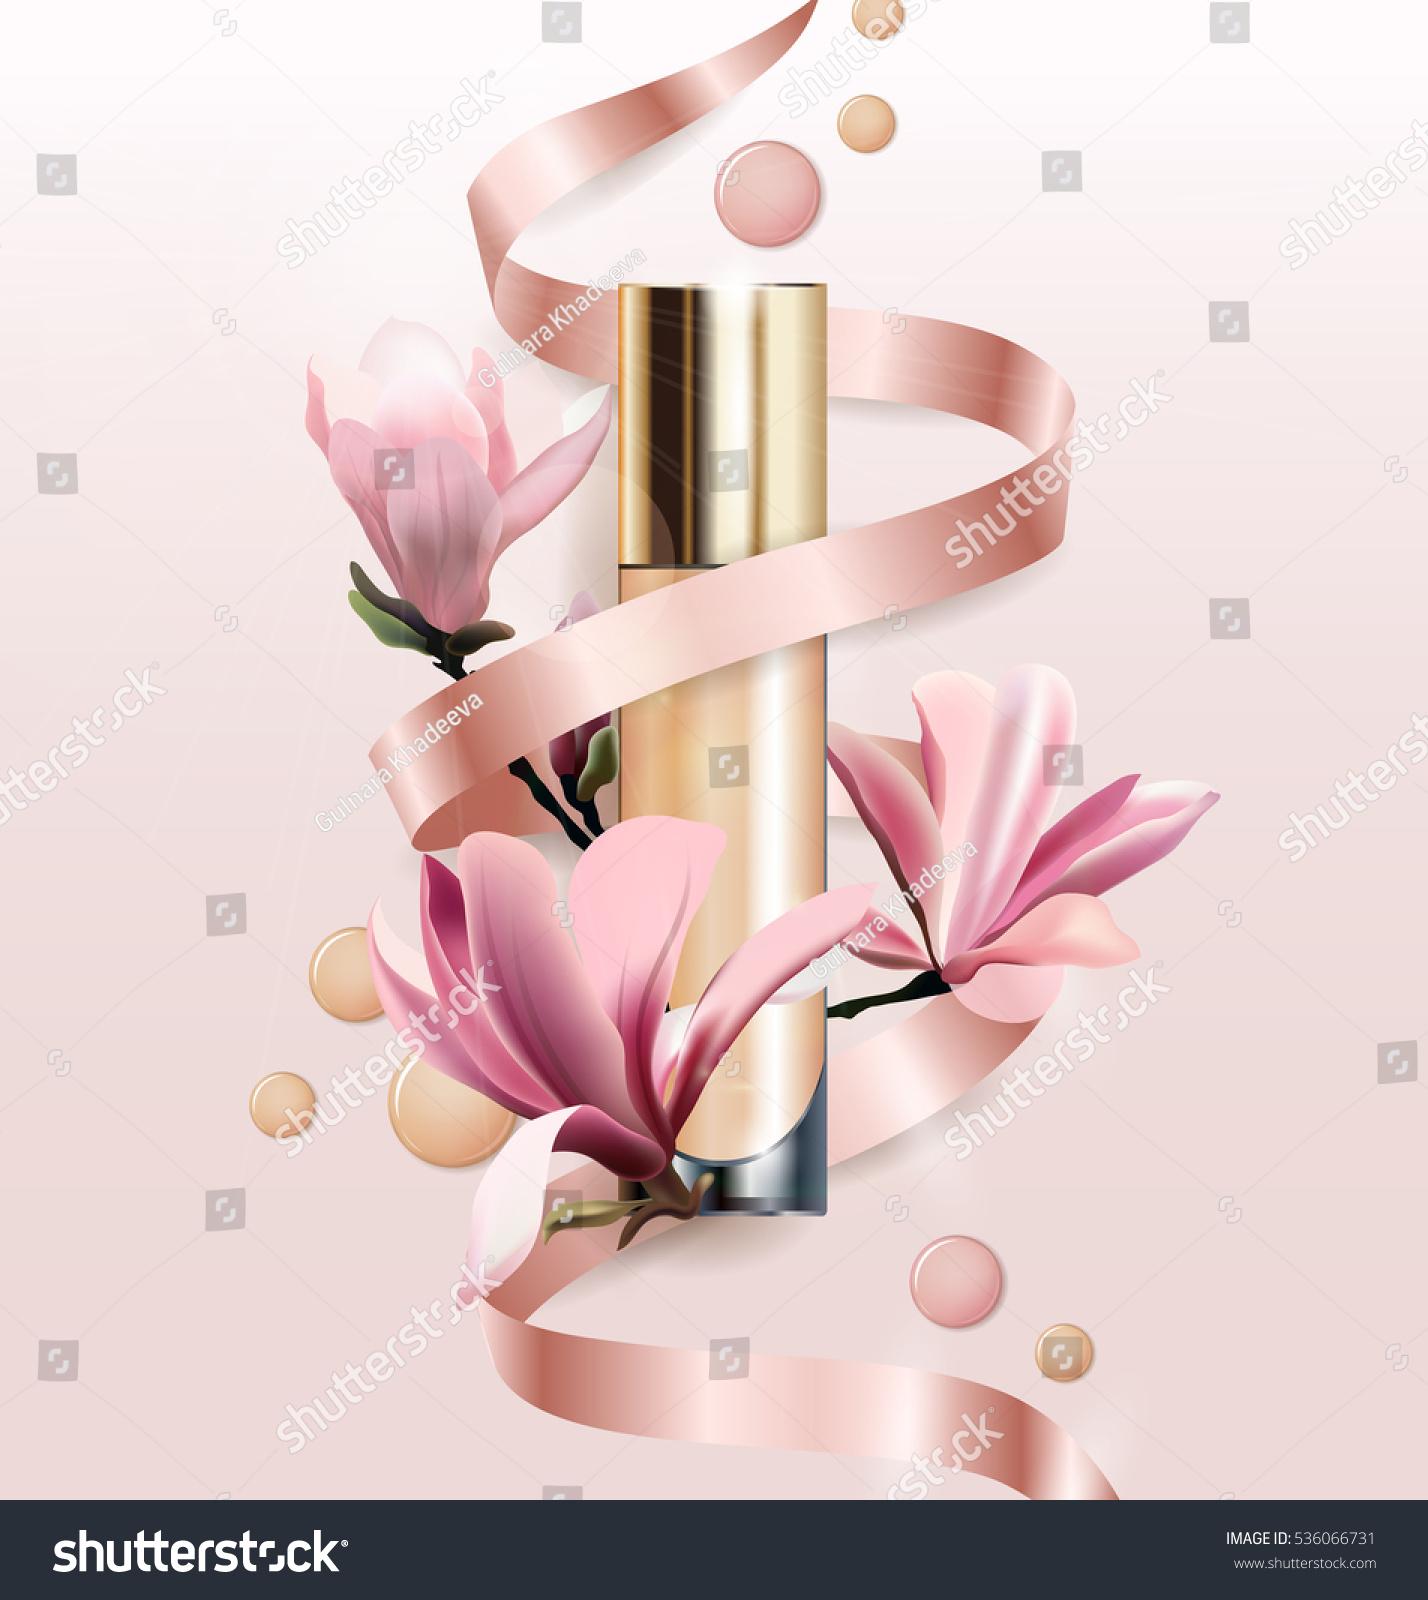 Cosmetic product foundation concealer cream flowers stock vector cosmetic product foundation concealer cream with flowers beautiful bottle with flowers magnolia izmirmasajfo